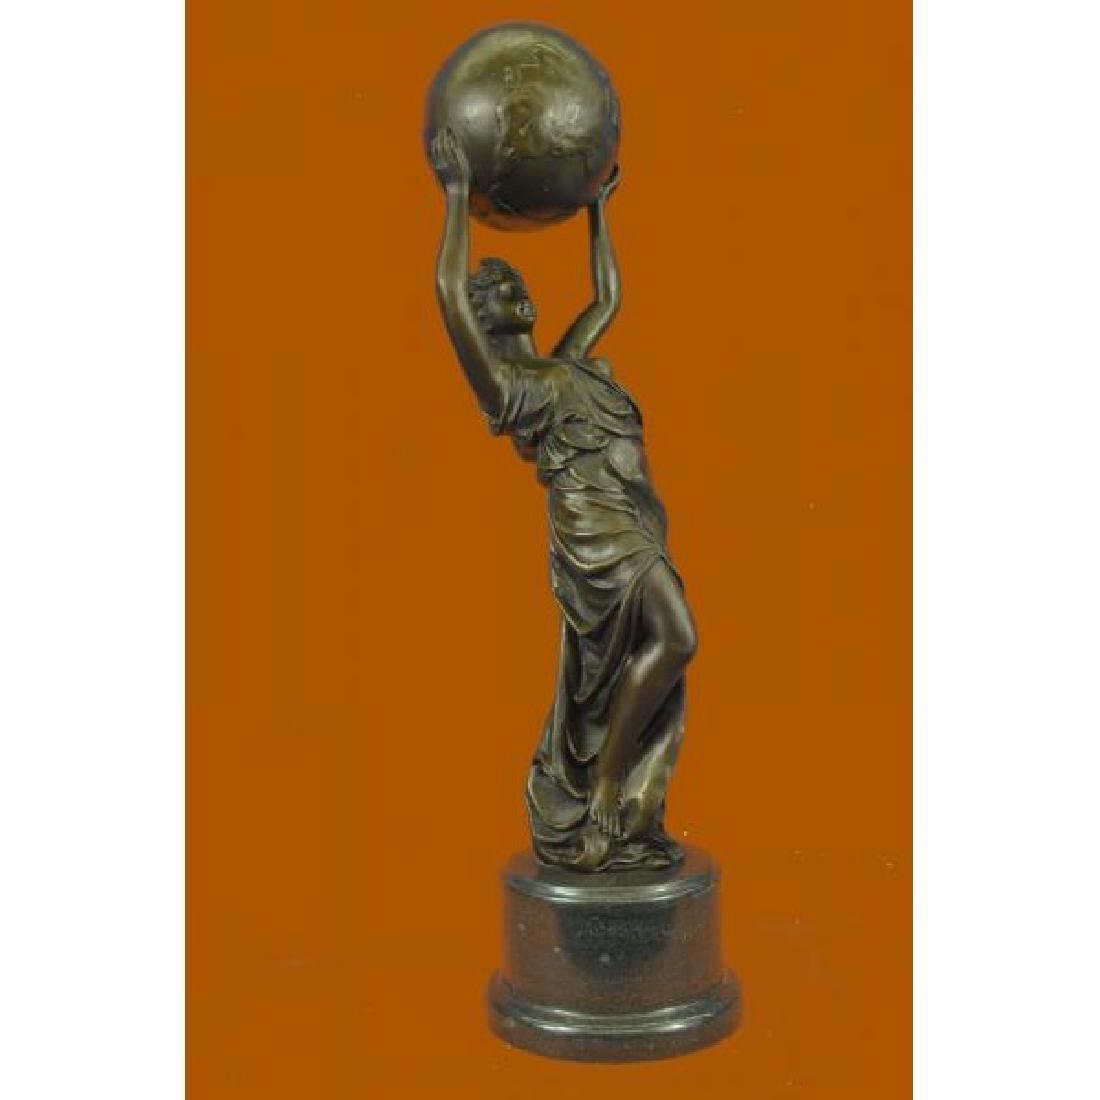 Nude Female Atlas Holding the World Bronze Sculpture - 2